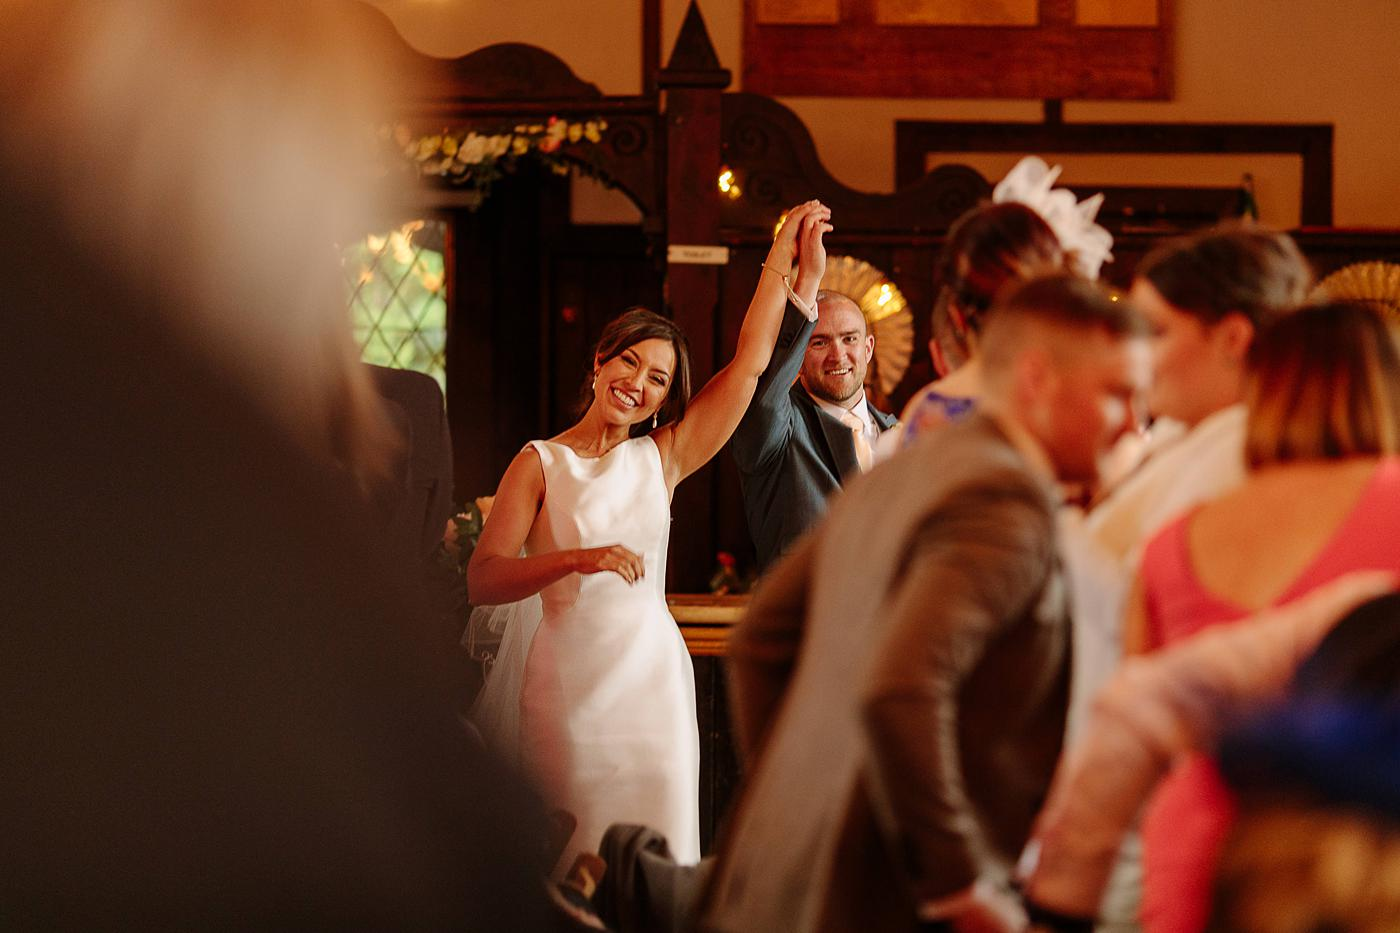 Winstanstow wedding photography 0779